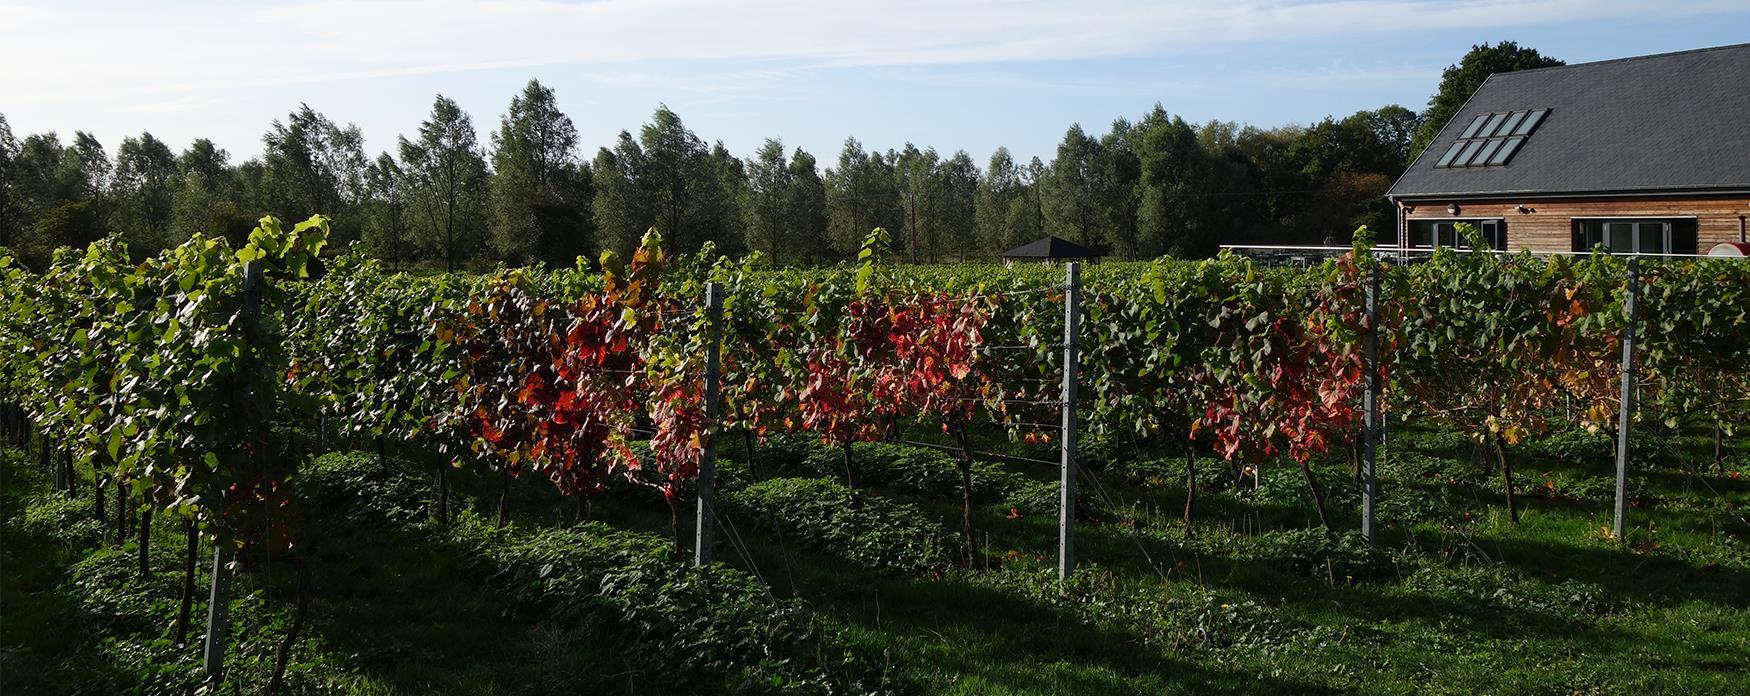 Vines turning golden in autumn